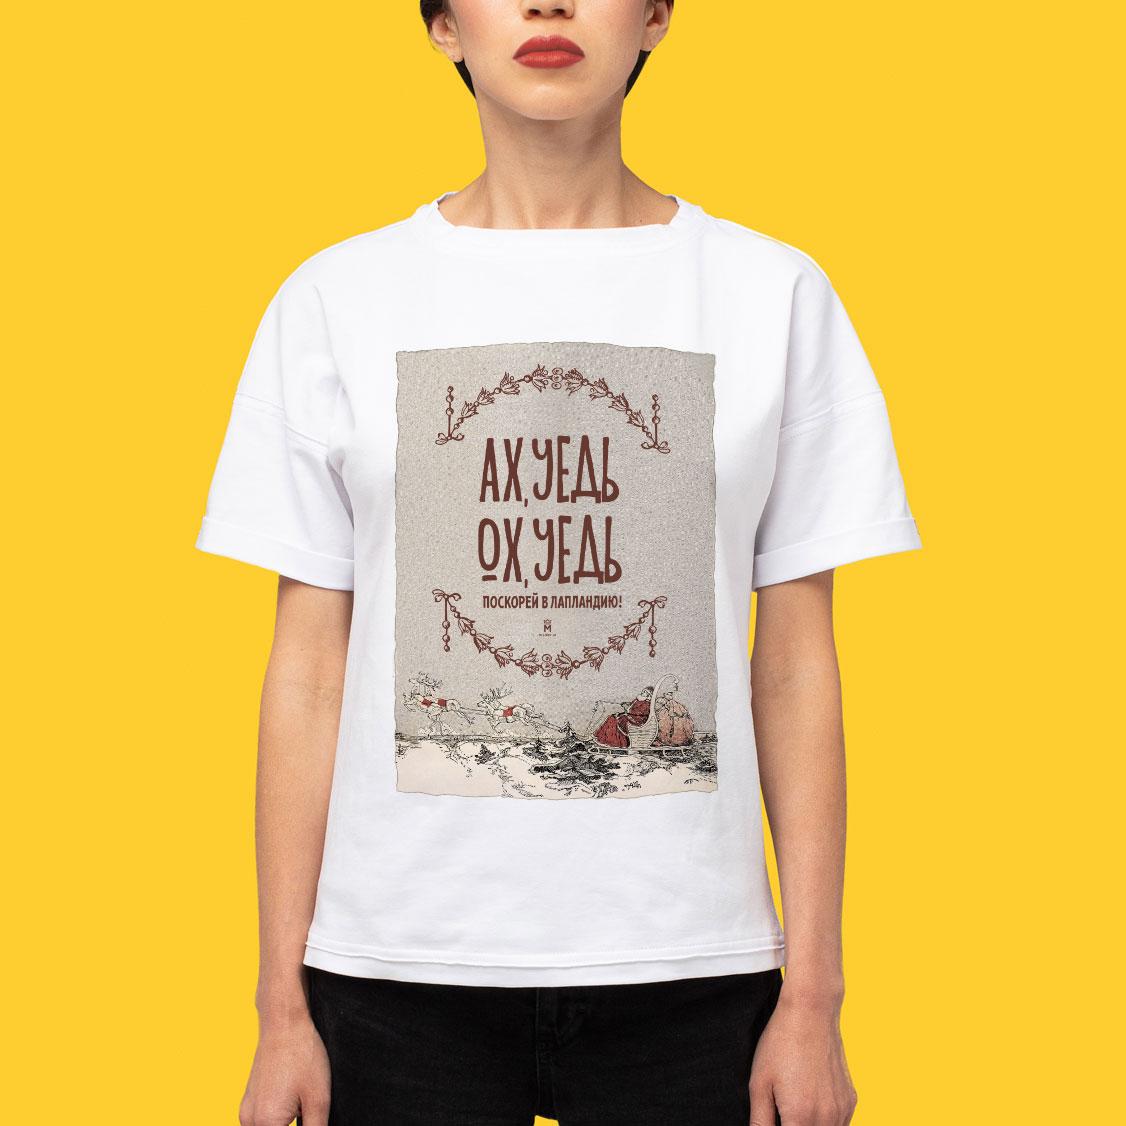 МАЙКАДЖЕКСОН - Ах, уедь – Ох, уедь (новогодняя футболка)